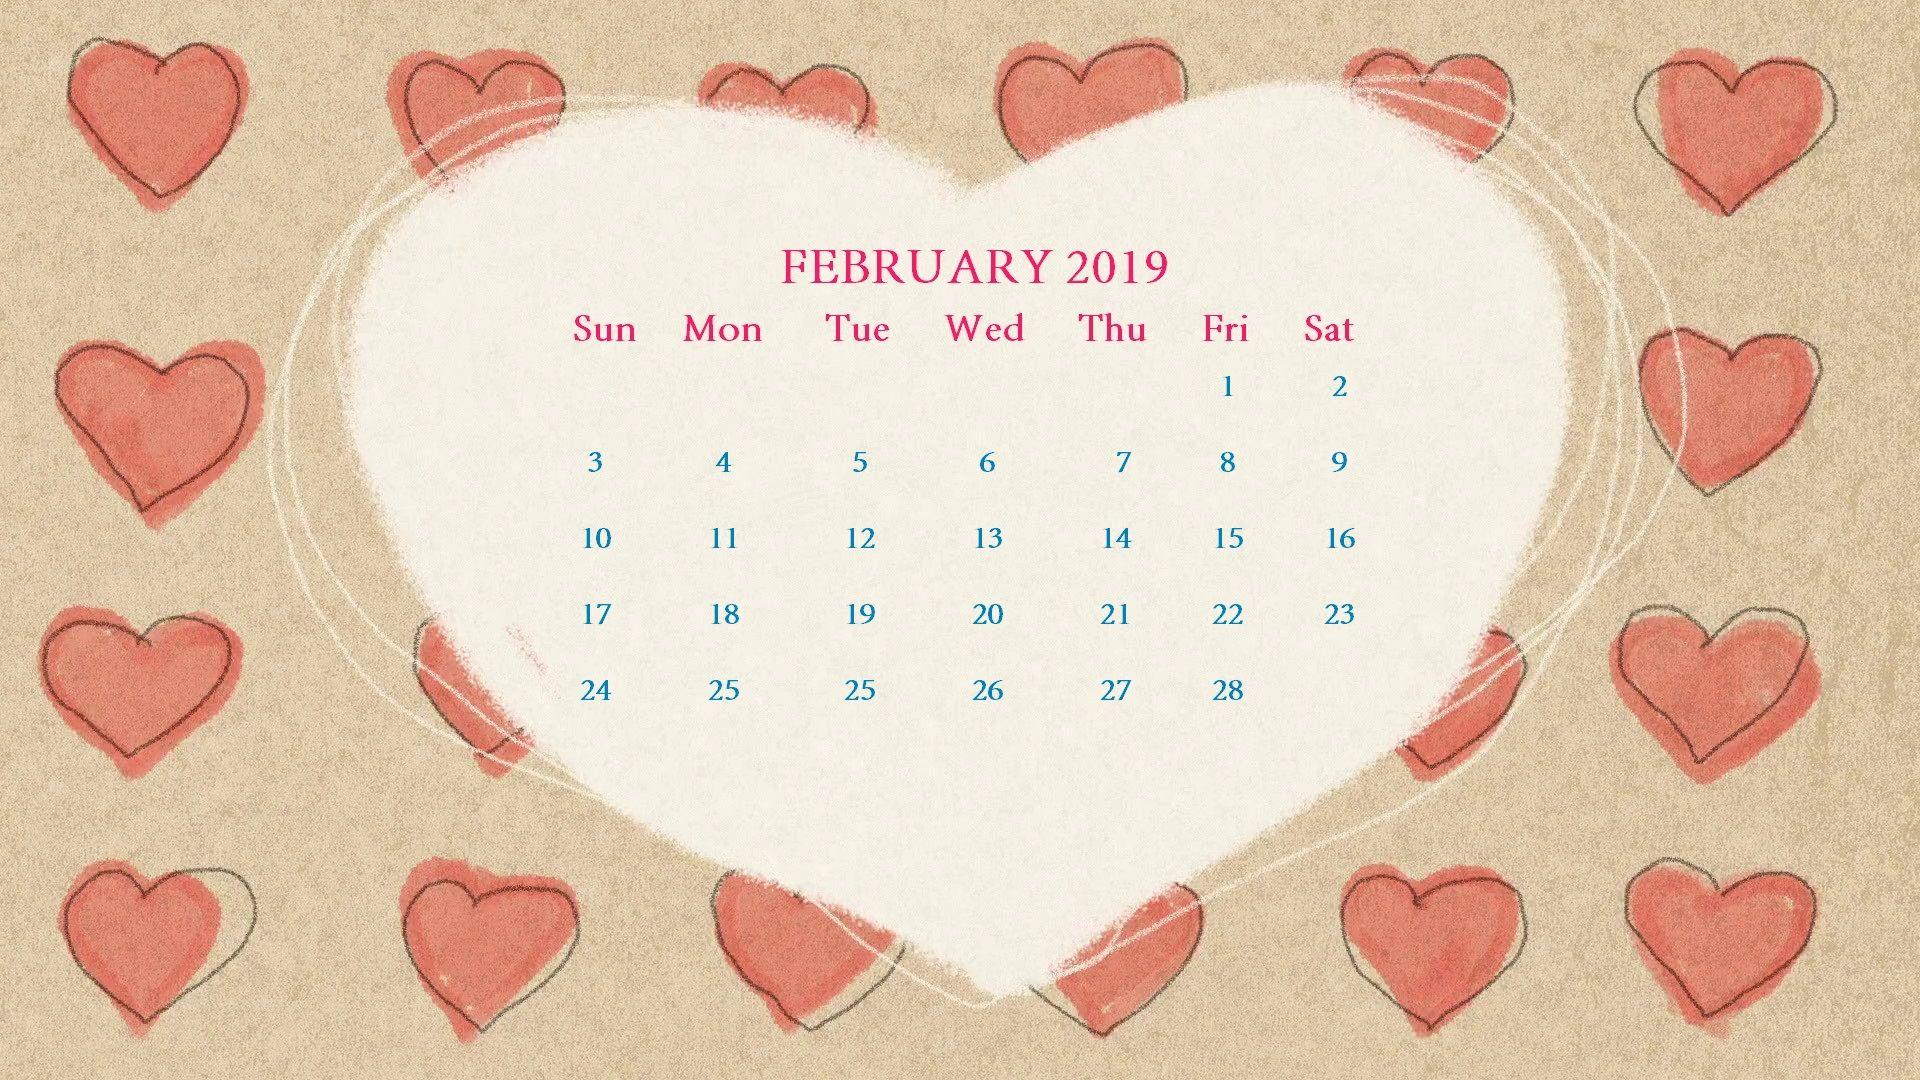 Calendar February 2019 Valentine February 2019 Love Design Wallpaper Calendar Valentines Day Theme